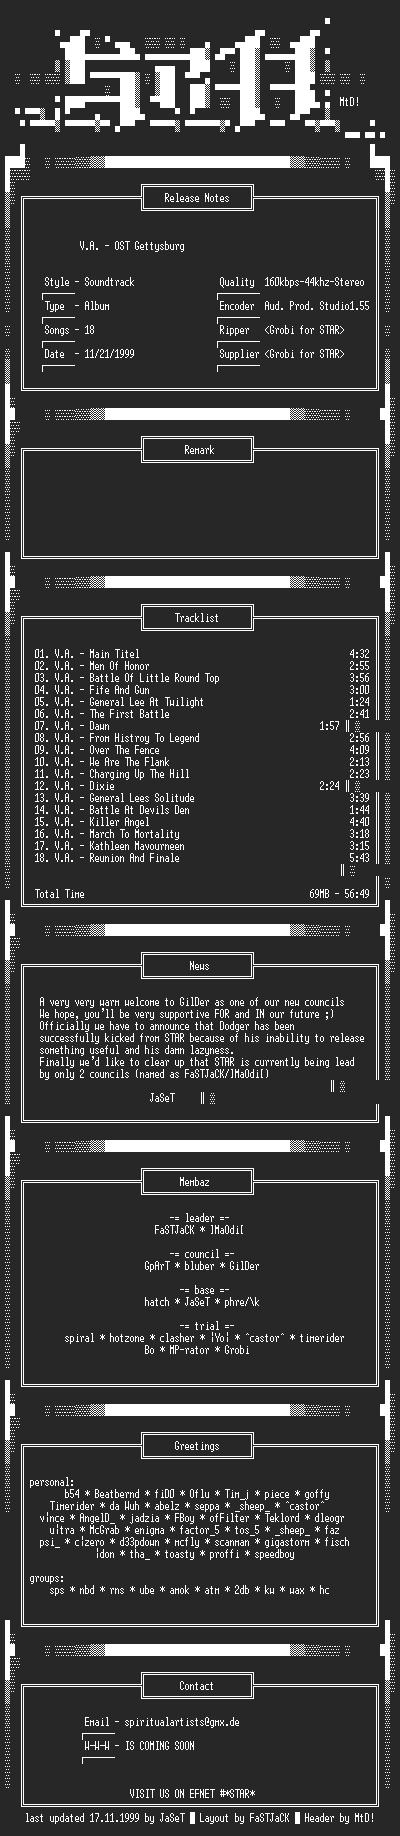 NFO file for V.A.-OST_Gettysburg-(1999)-STAR